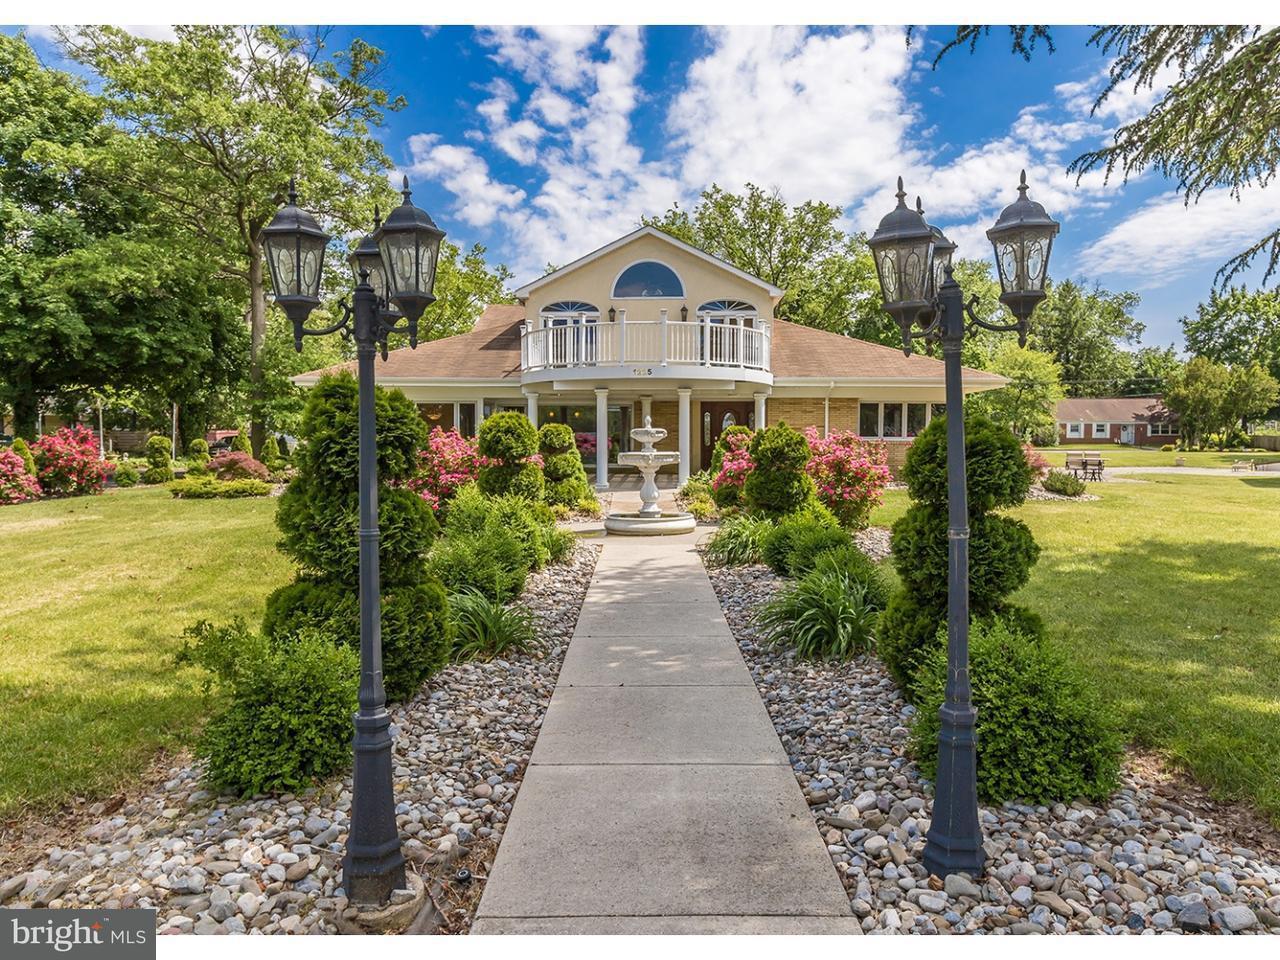 Single Family Home for Sale at 1225 DELAWARE Avenue Delanco, New Jersey 08075 United States